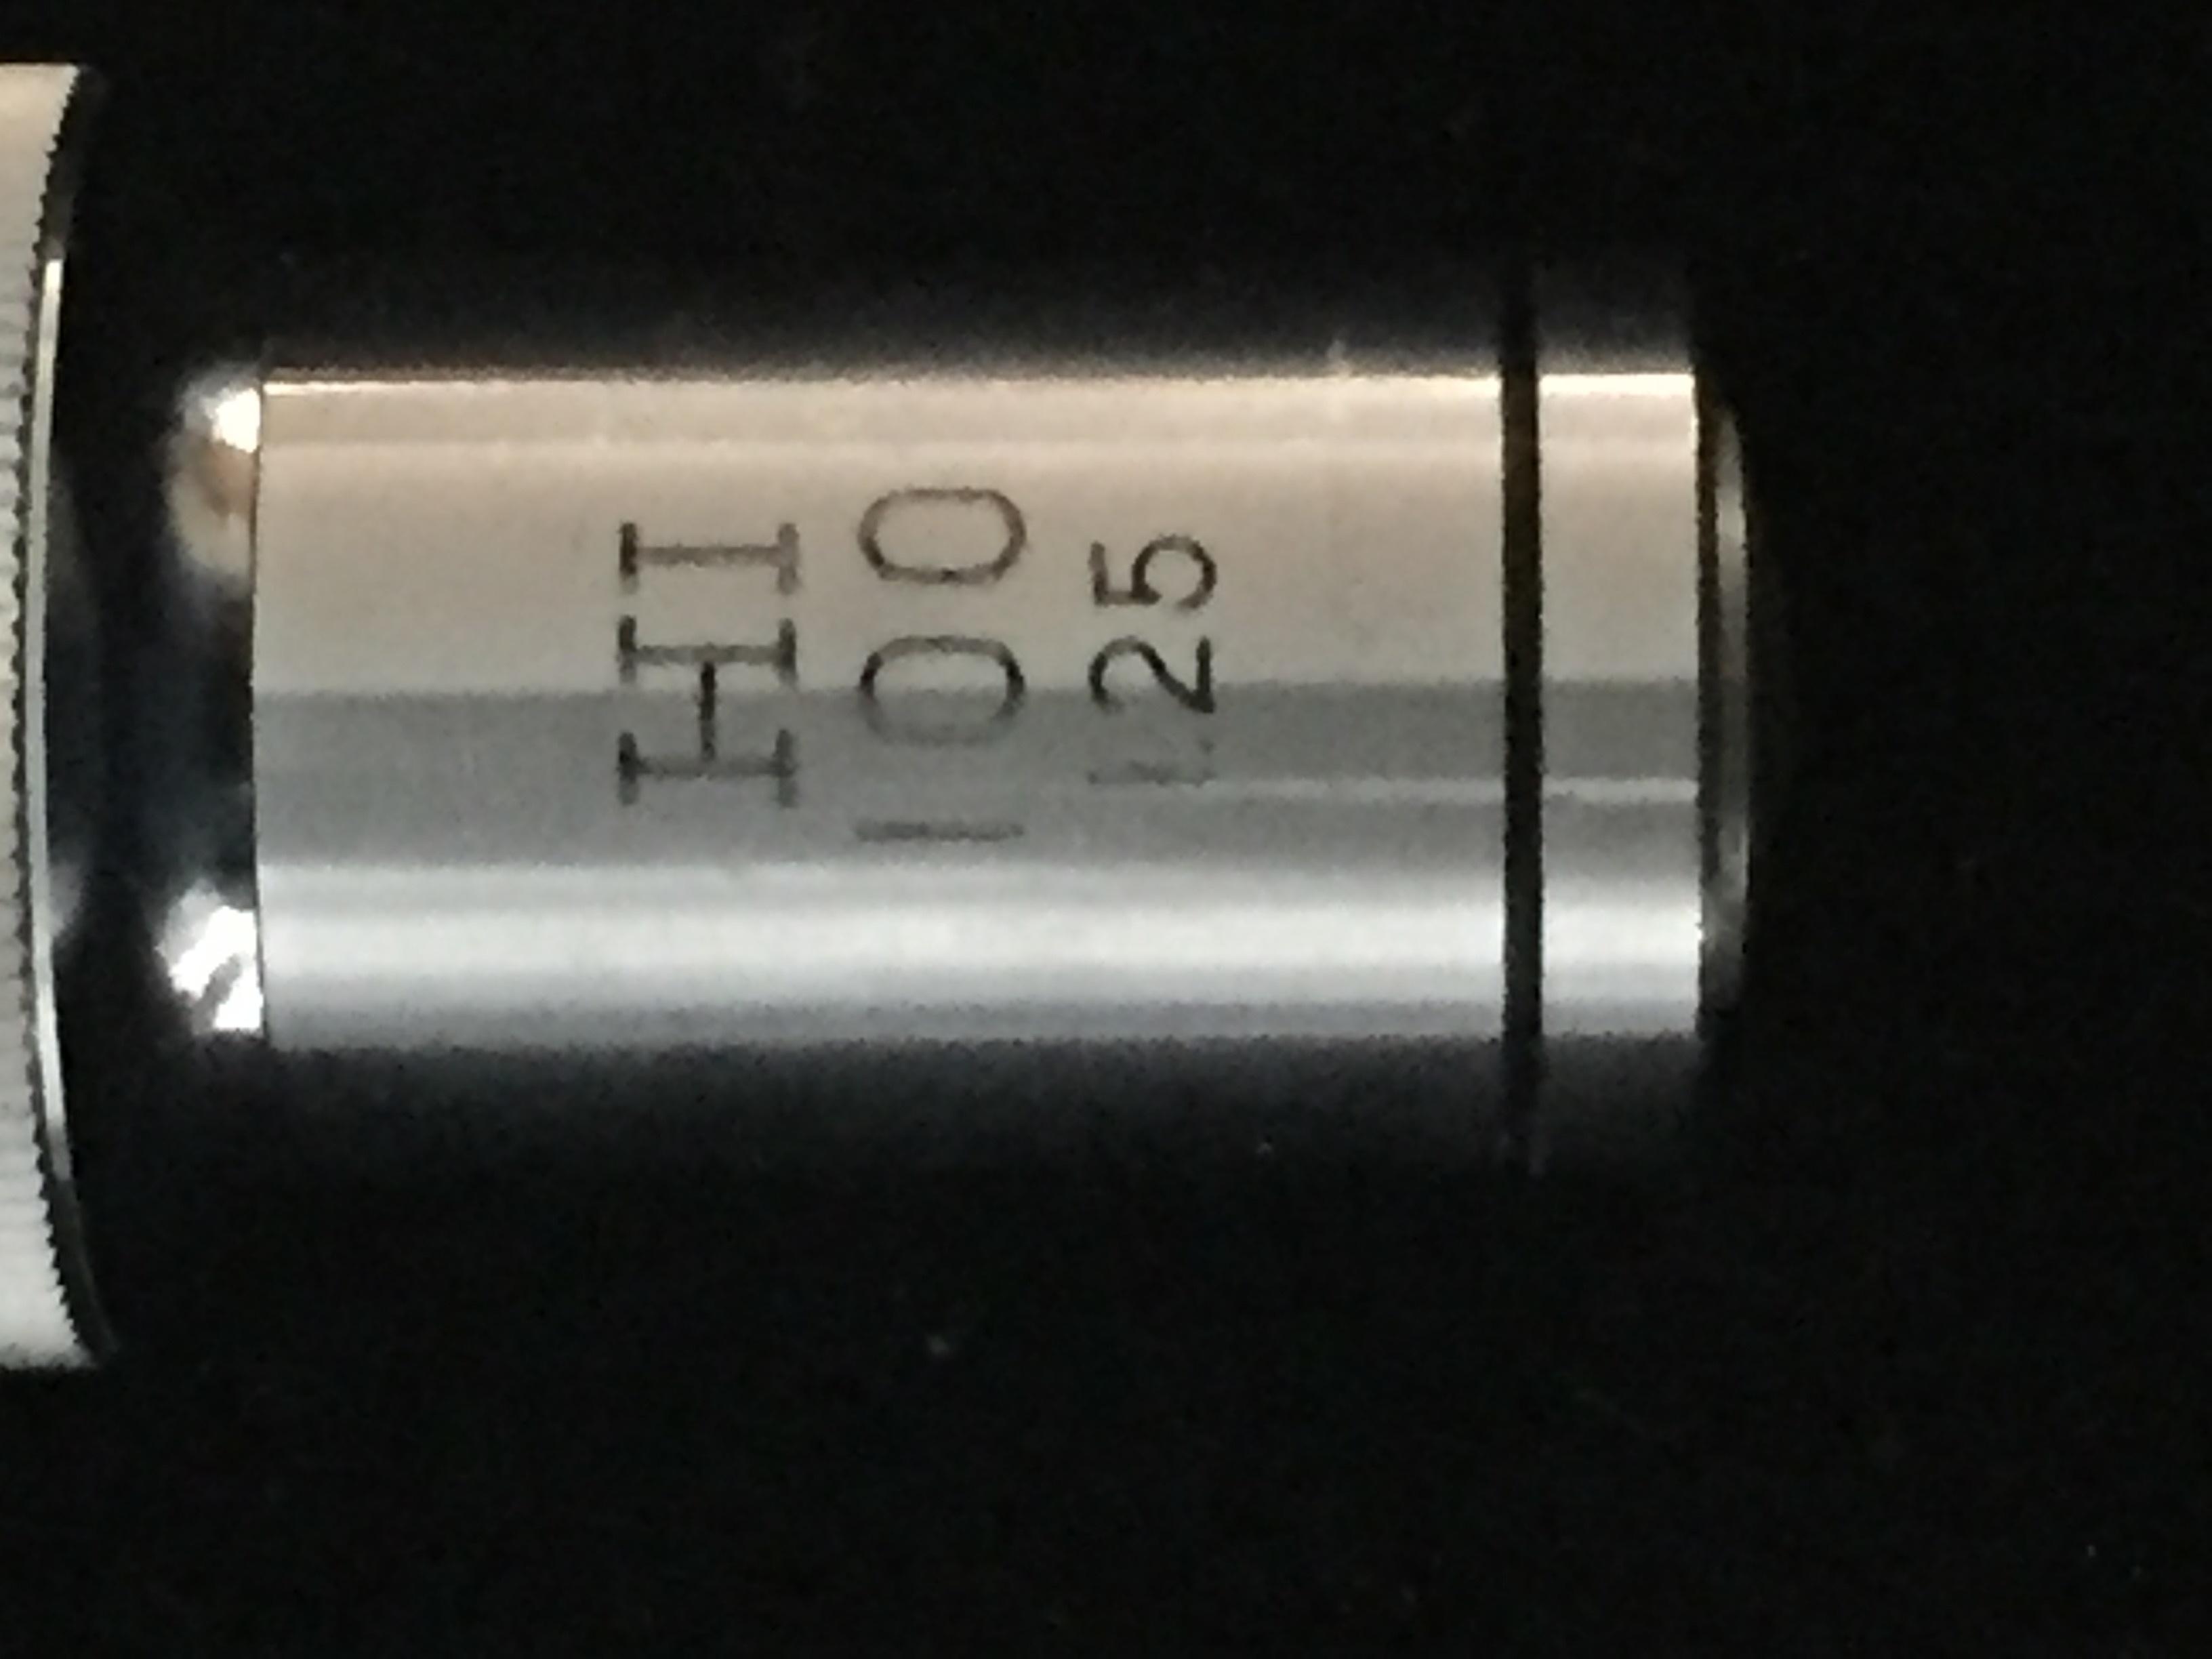 Objetivo microscópio